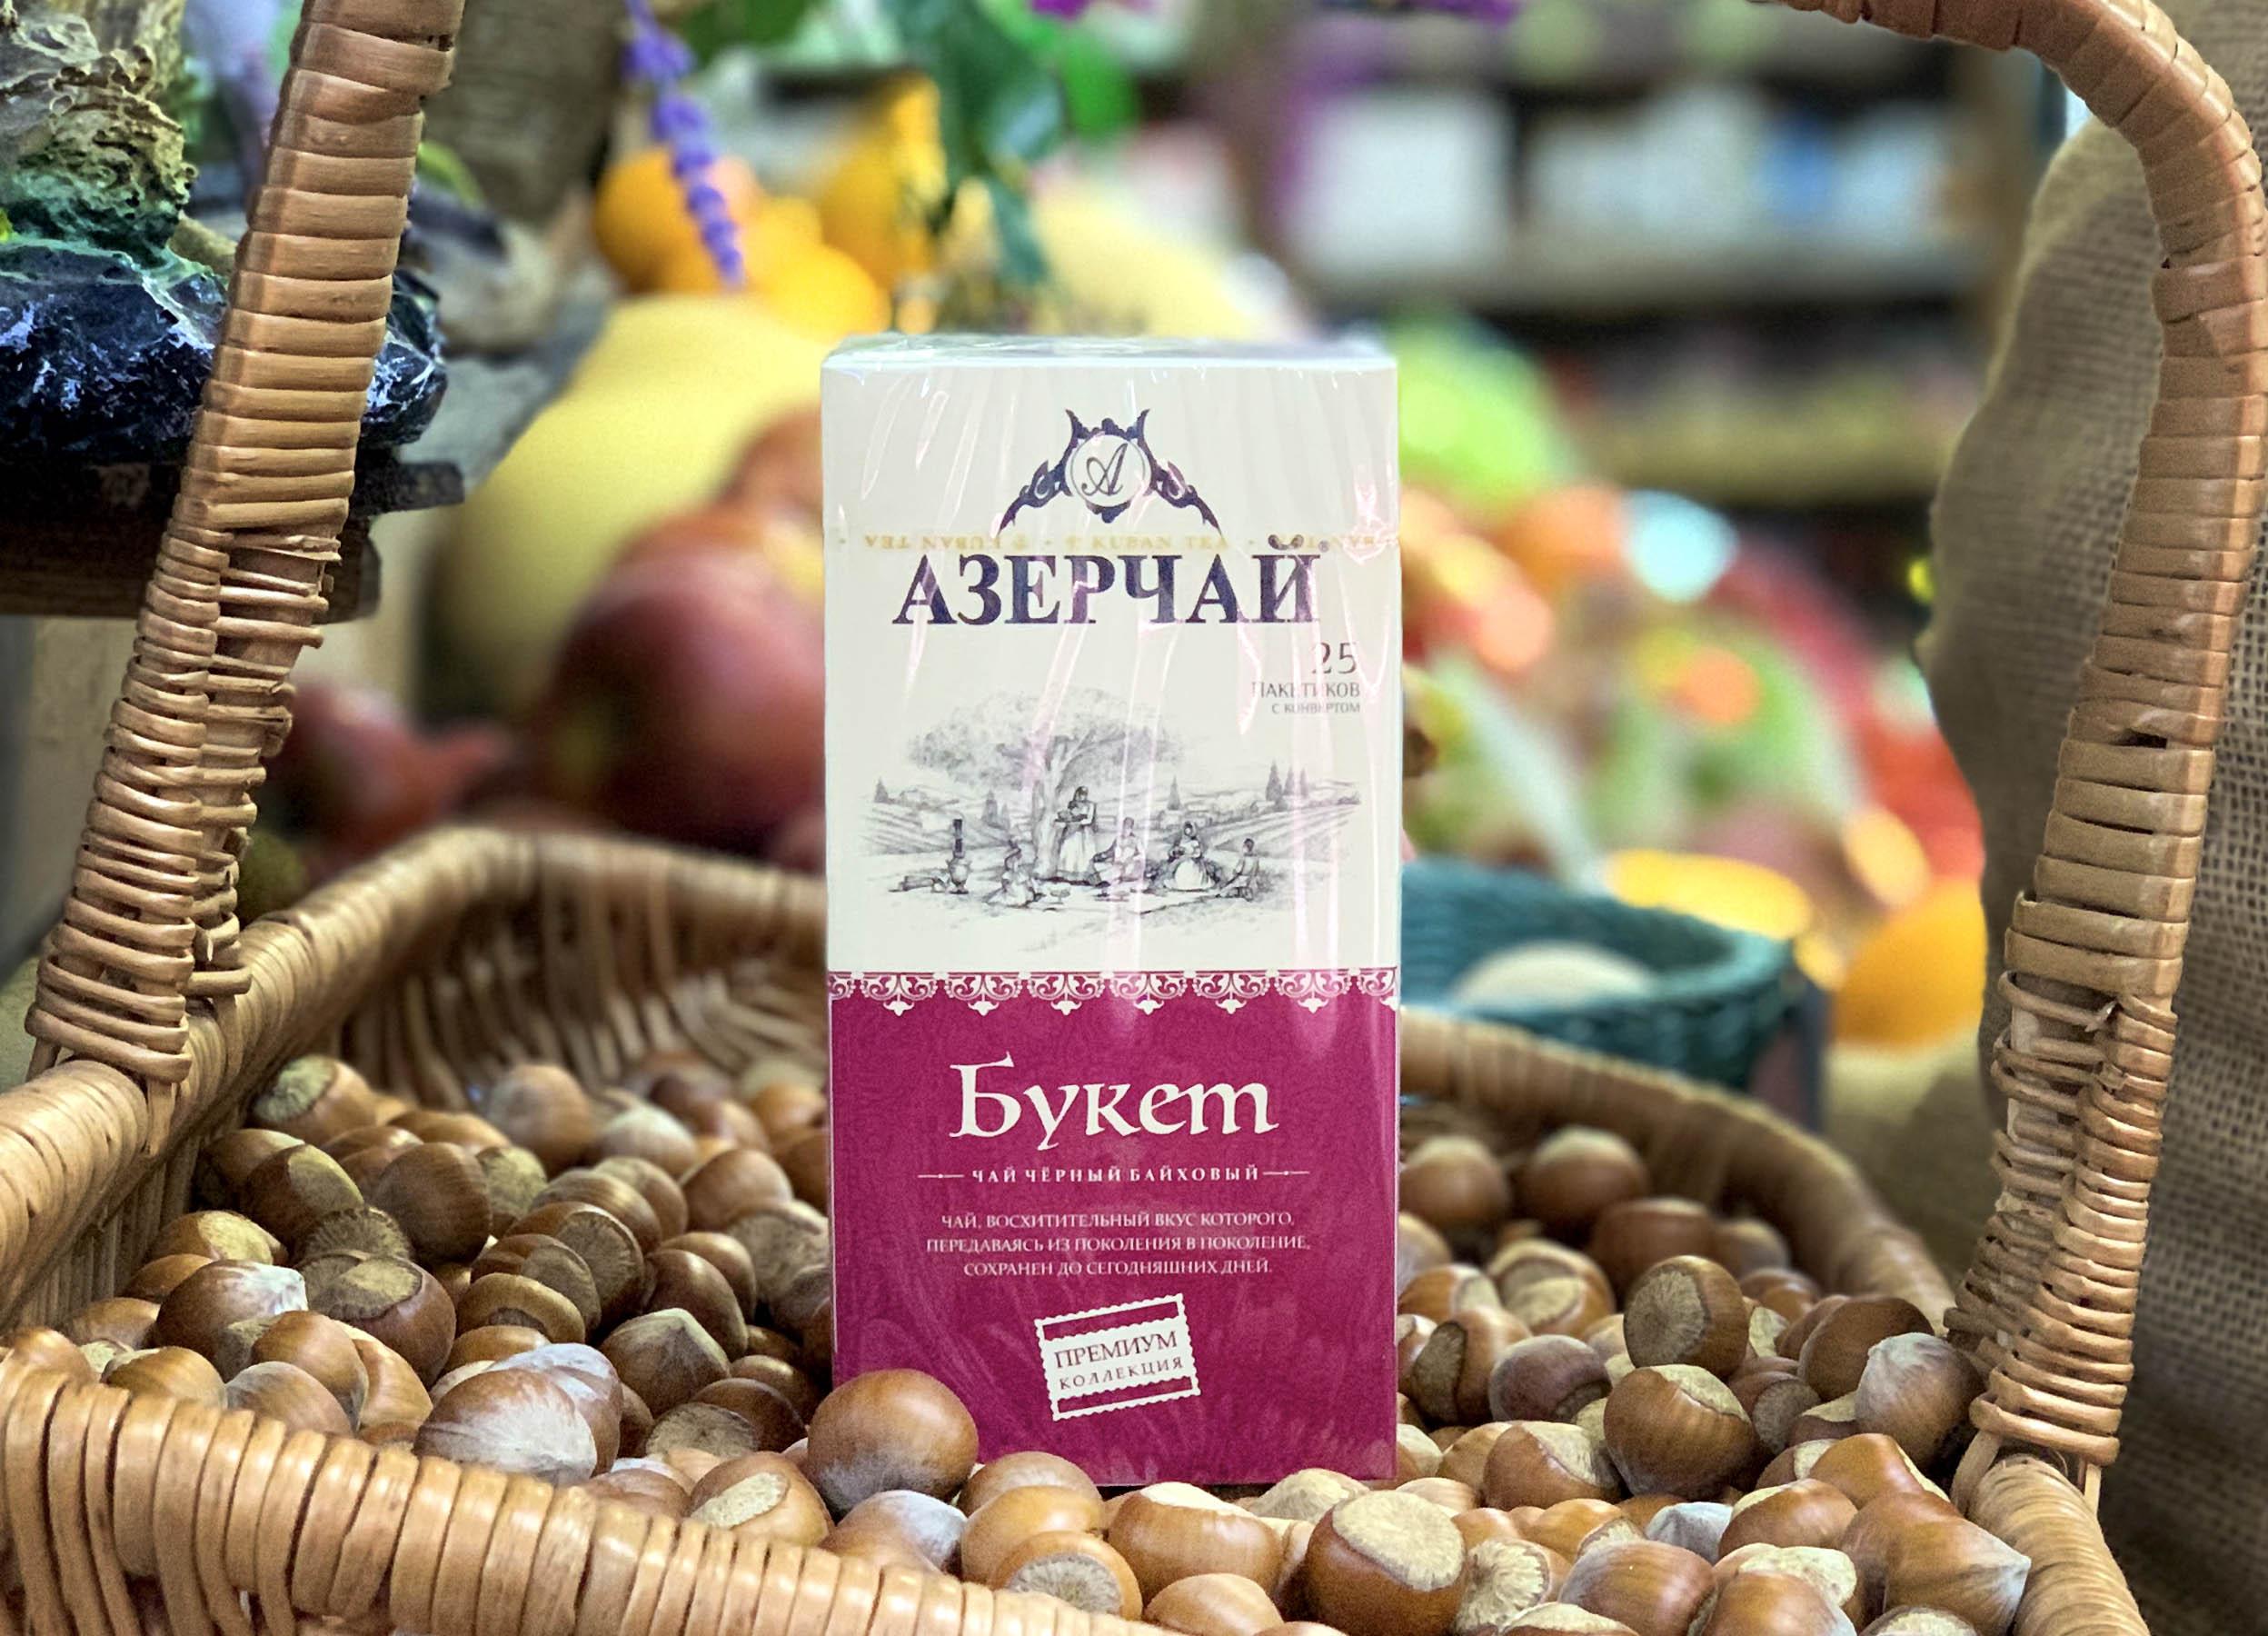 Азерчай Premium коллекция Букет, 25 пакетов